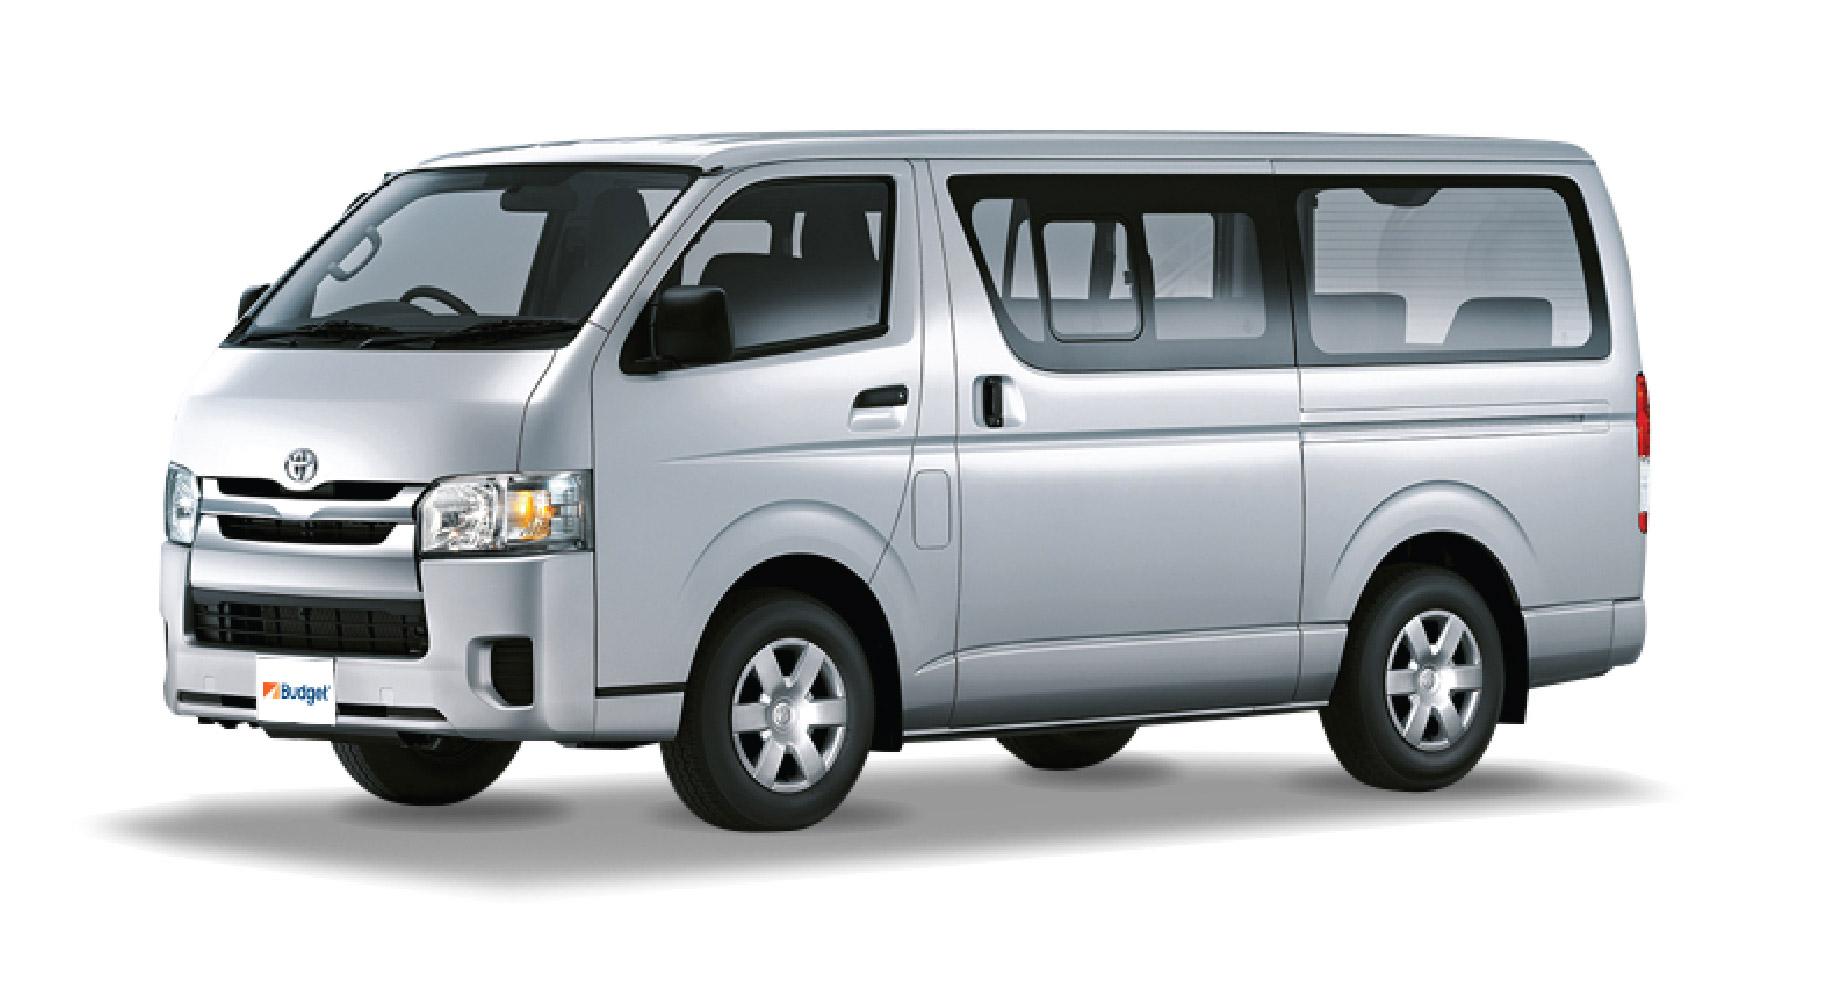 Toyota Hiace or similar